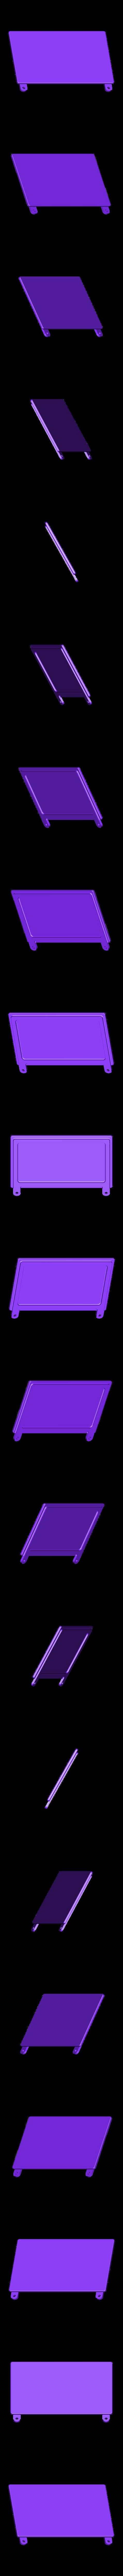 fake_manga_screen.STL Download free STL file Poppy Torso • 3D printable model, PoppyProject